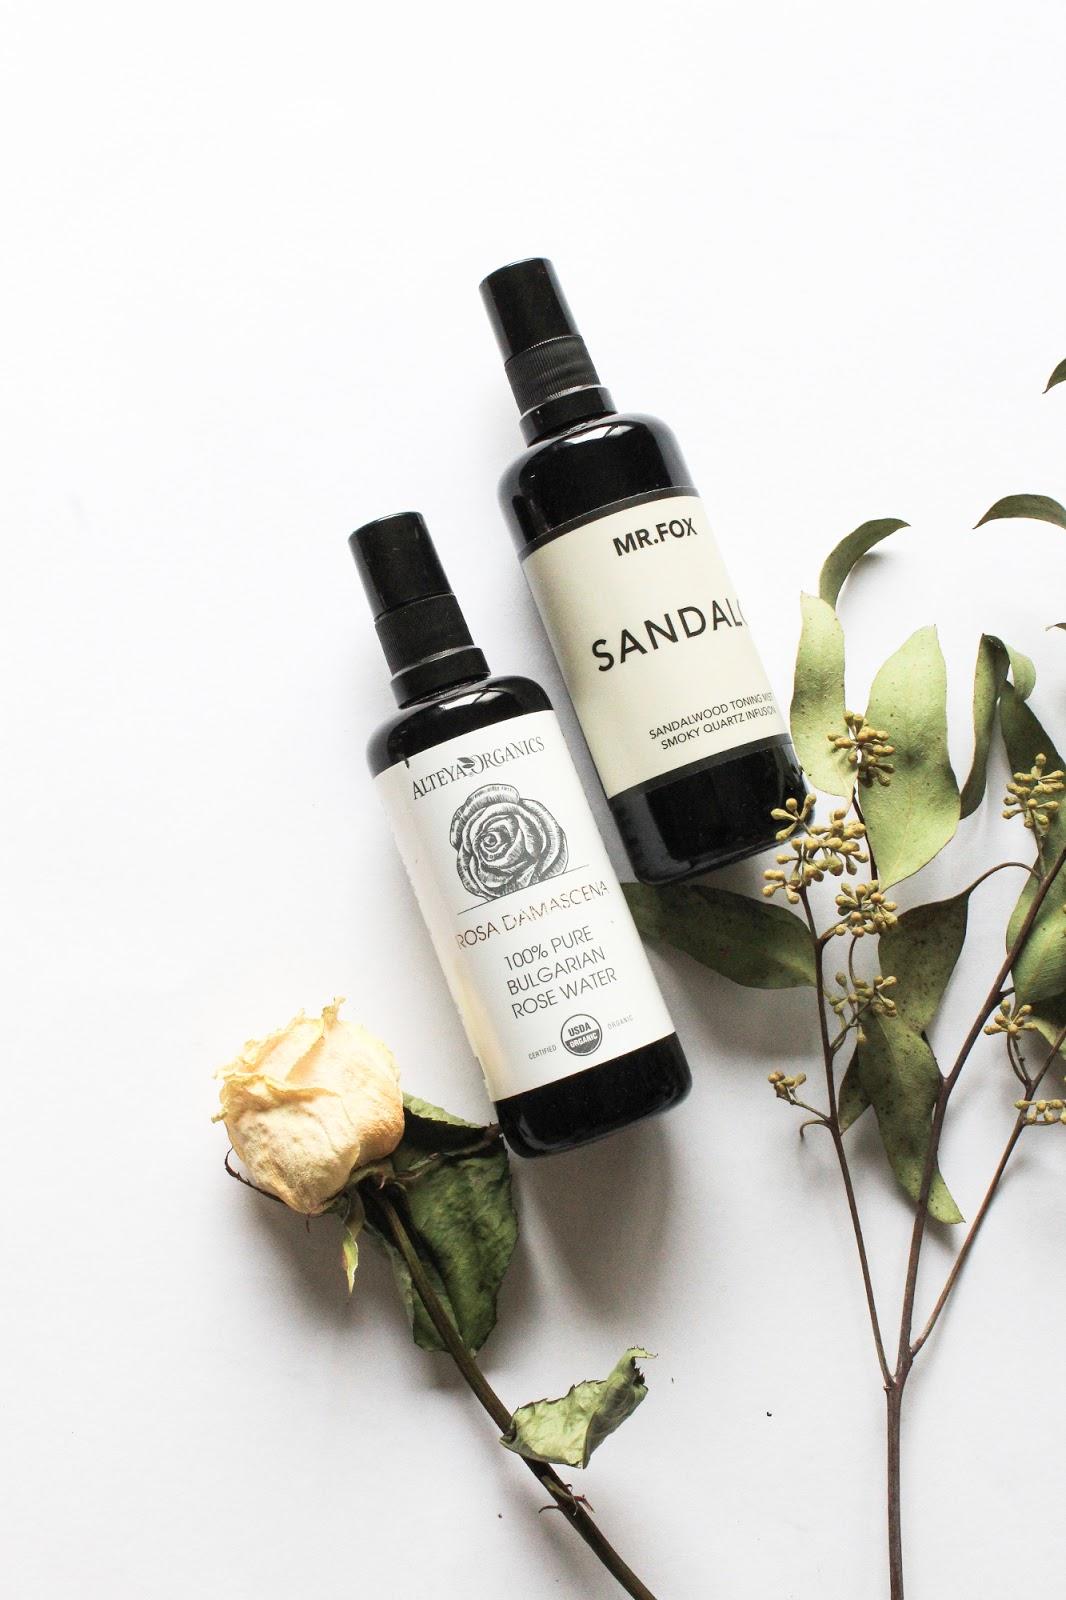 Alteya Organics Pure Bulgarian Rose Water and LILFOX Mr. Fox Sandalo Sandalwood Toning Mist